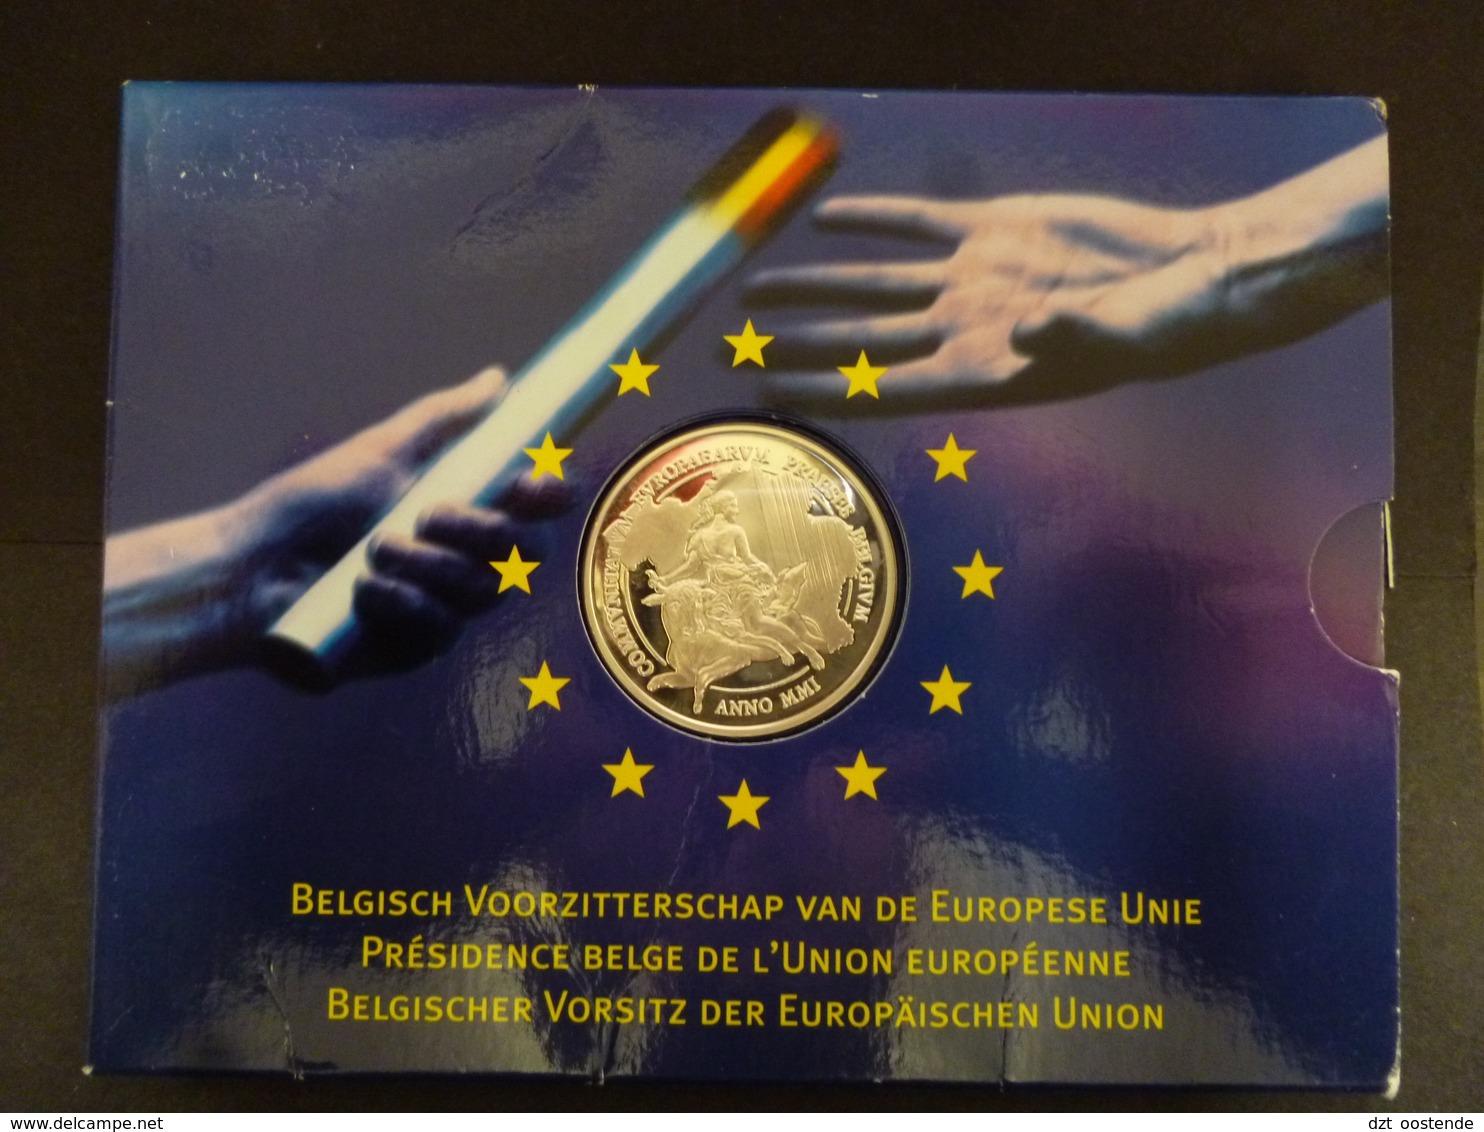 BELGIUM PROOFSET 500 FRANK JAAR 2001  EUROPESE UNIE - 08. 500 & 5000 Francs